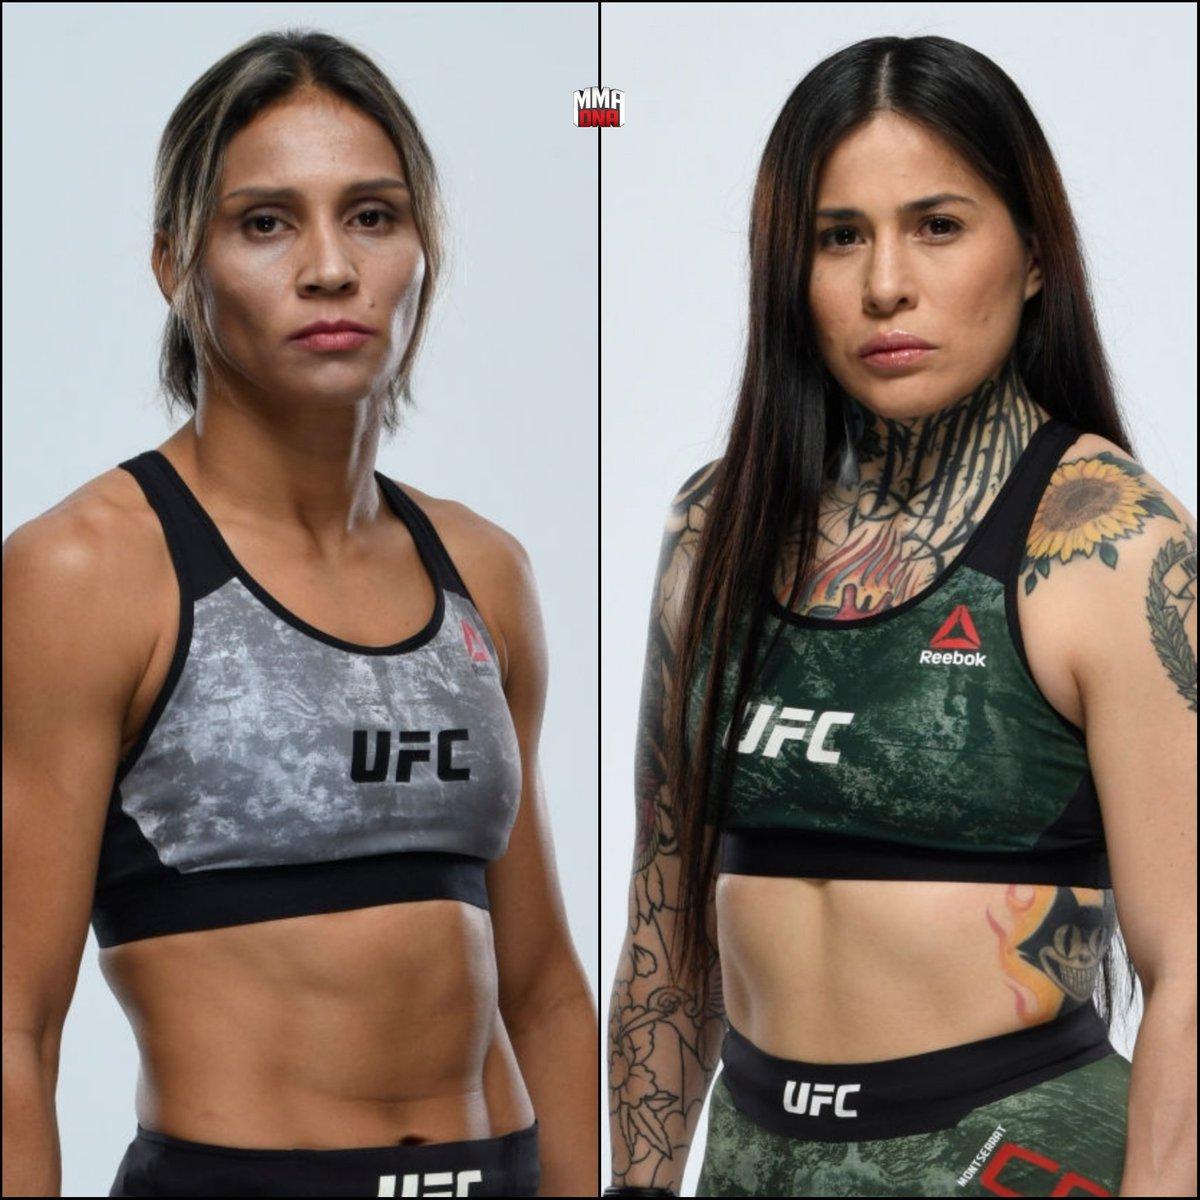 Amanda Lemos will fight Montserrat Ruiz at UFC event on July 17th. (per @CCLegaspi/@ESPNDeportes) #UFC #MMA #UFCESPN #WMMA https://t.co/NePhj1bawh